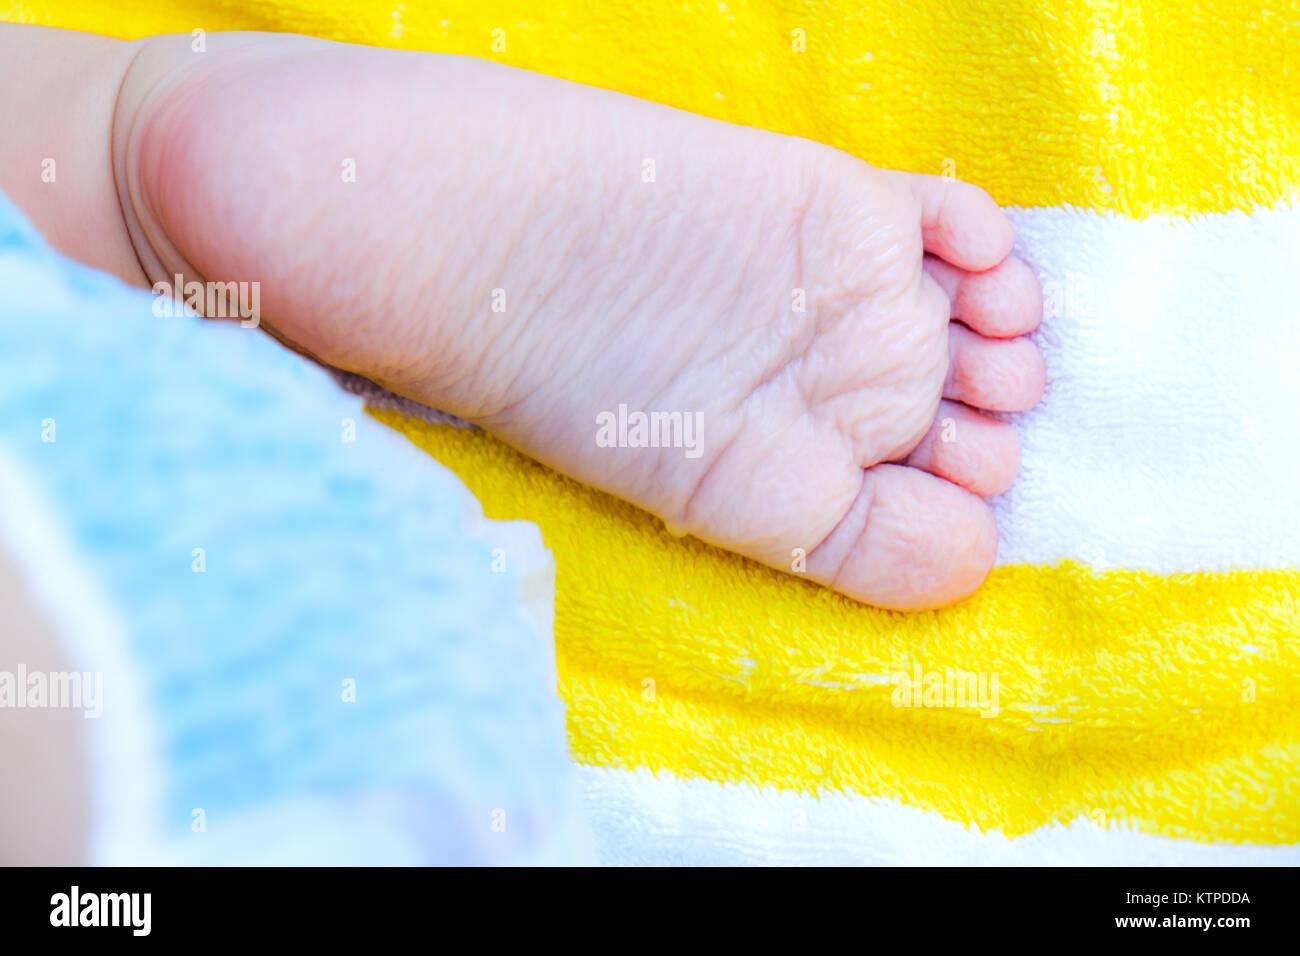 Vasca Da Bagno Troppo Lunga : Stropicciata piedi piede neonato suole dopo troppo lunga vasca da